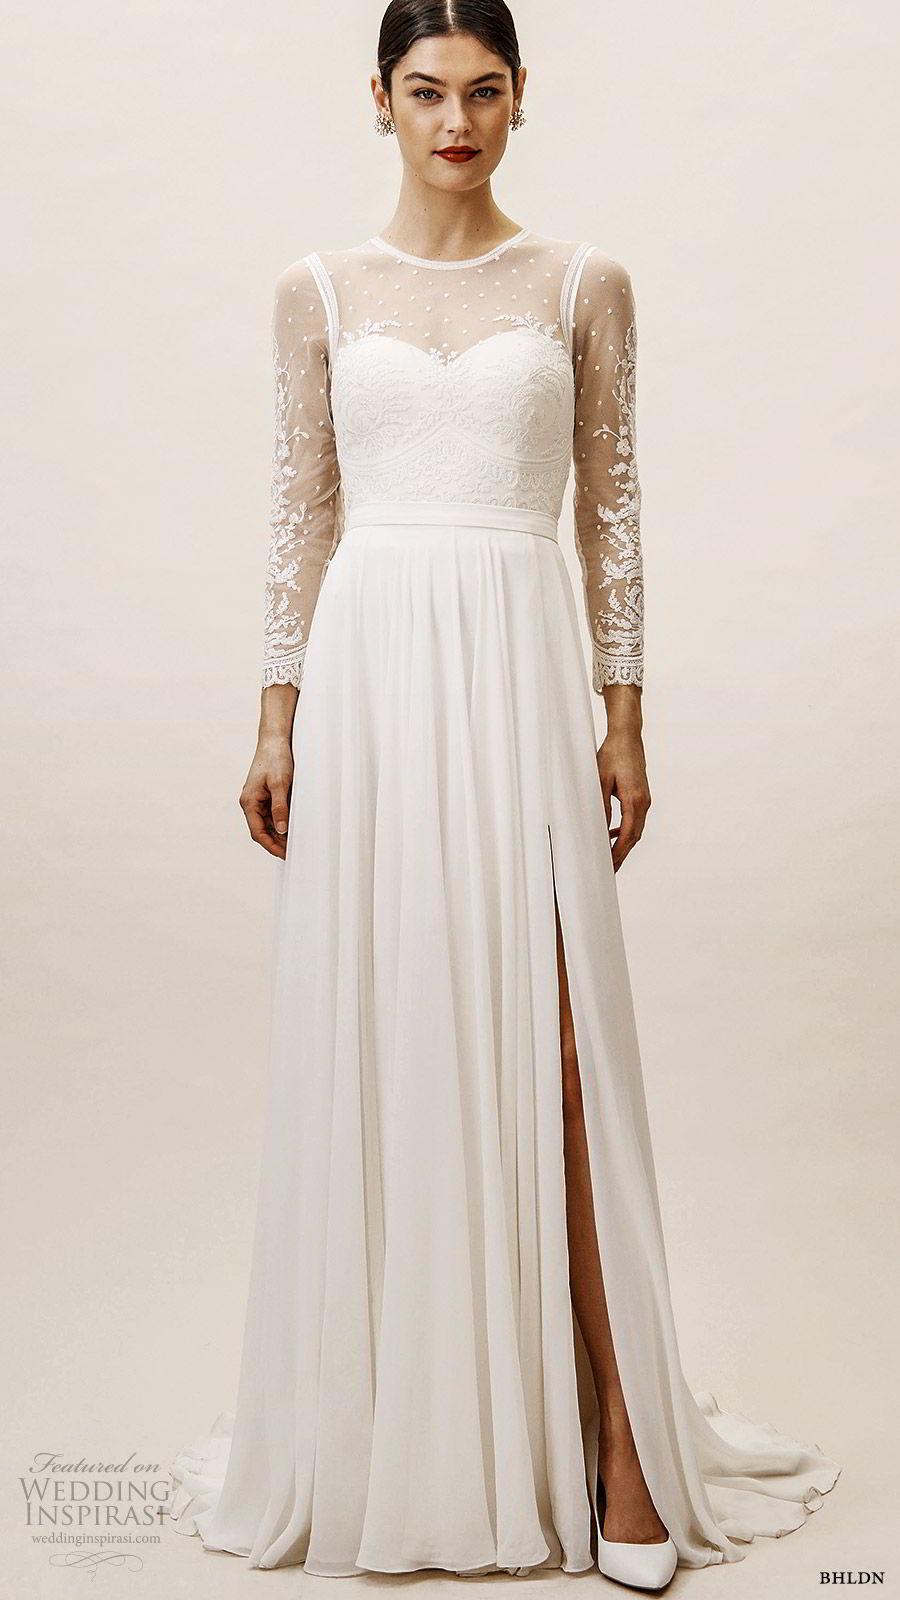 bhldn spring 2019 bridal illusion long sleeves sheer jewel neckline sweetheart bodice a line wedding dress slit skirt elegant (7) mv